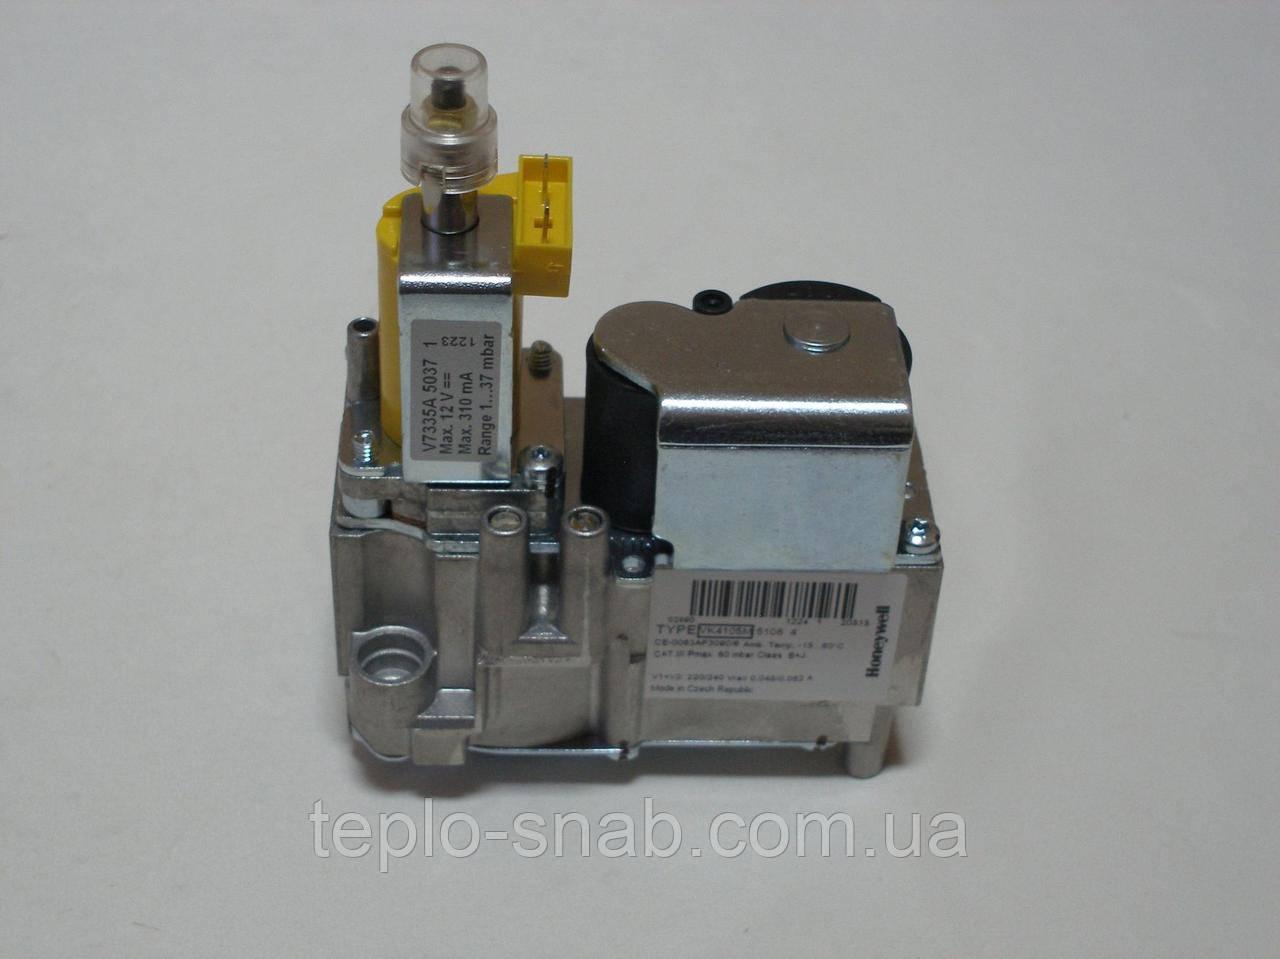 Газовый клапан Honeywell VK 4105M. Westen/Baxi (до BYH446243972) 5665210, 566220